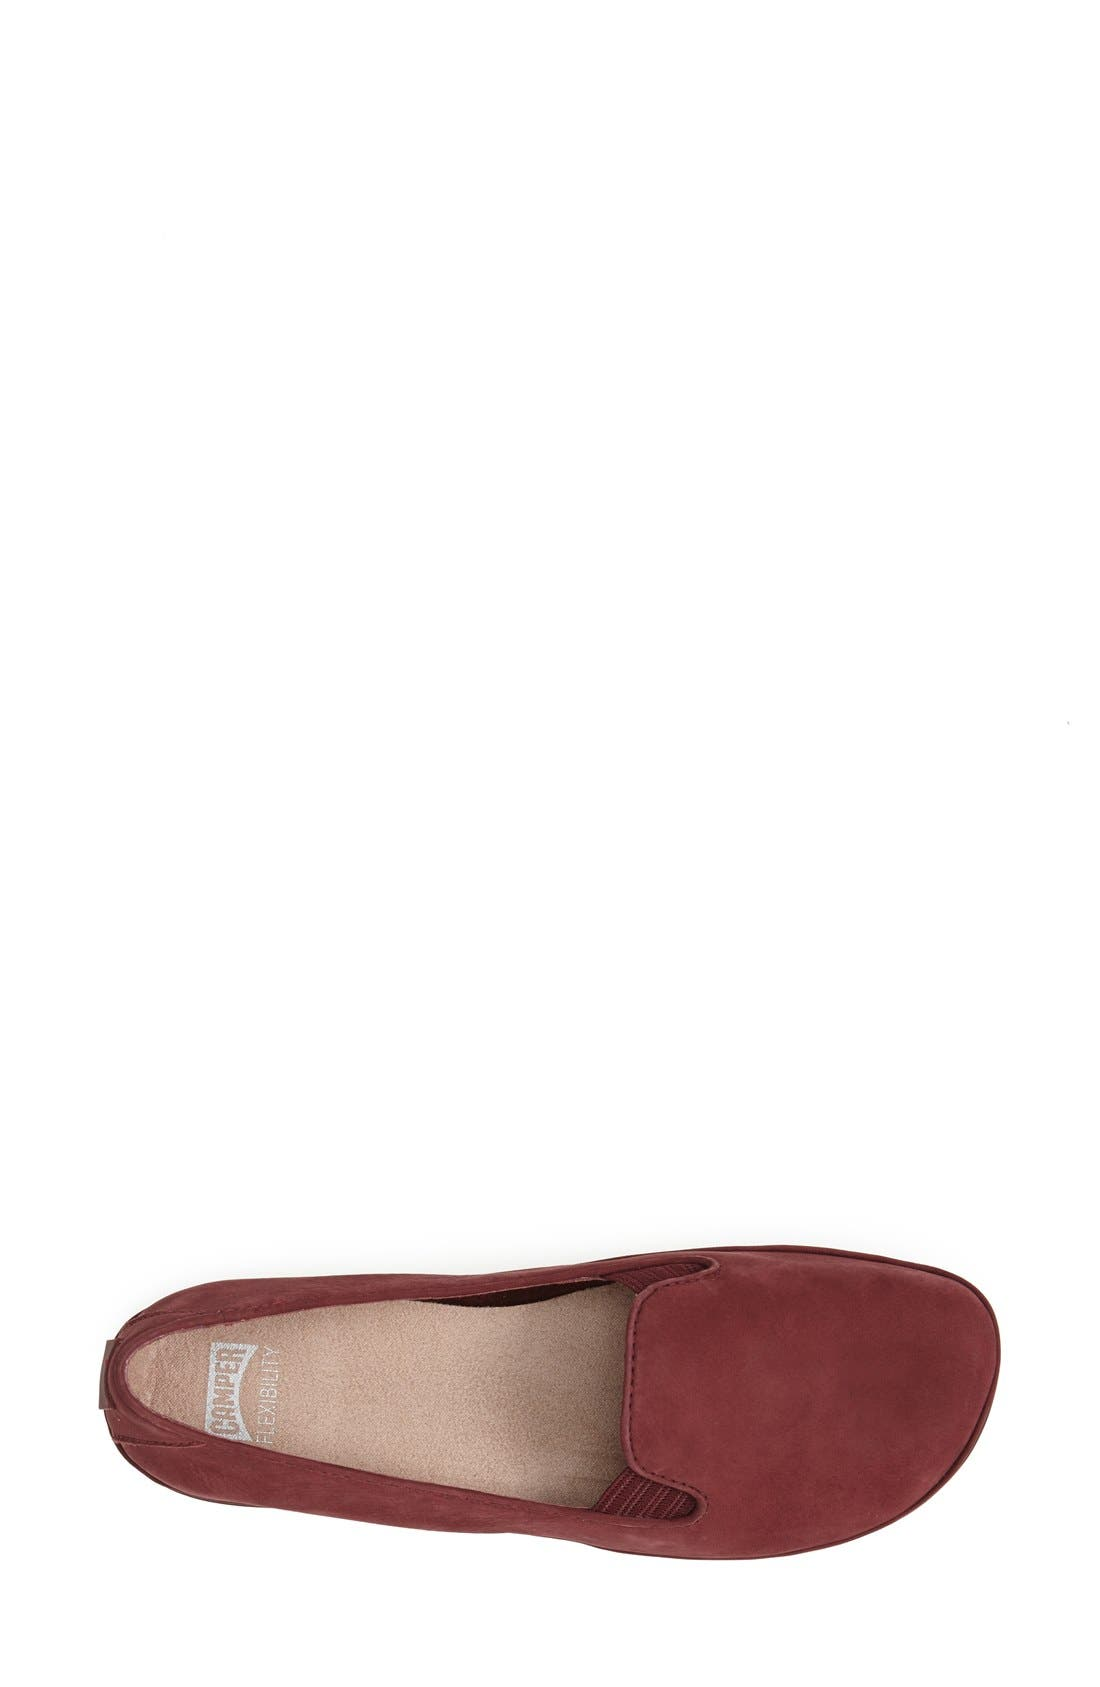 'Right Nina' Leather Flat,                             Alternate thumbnail 17, color,